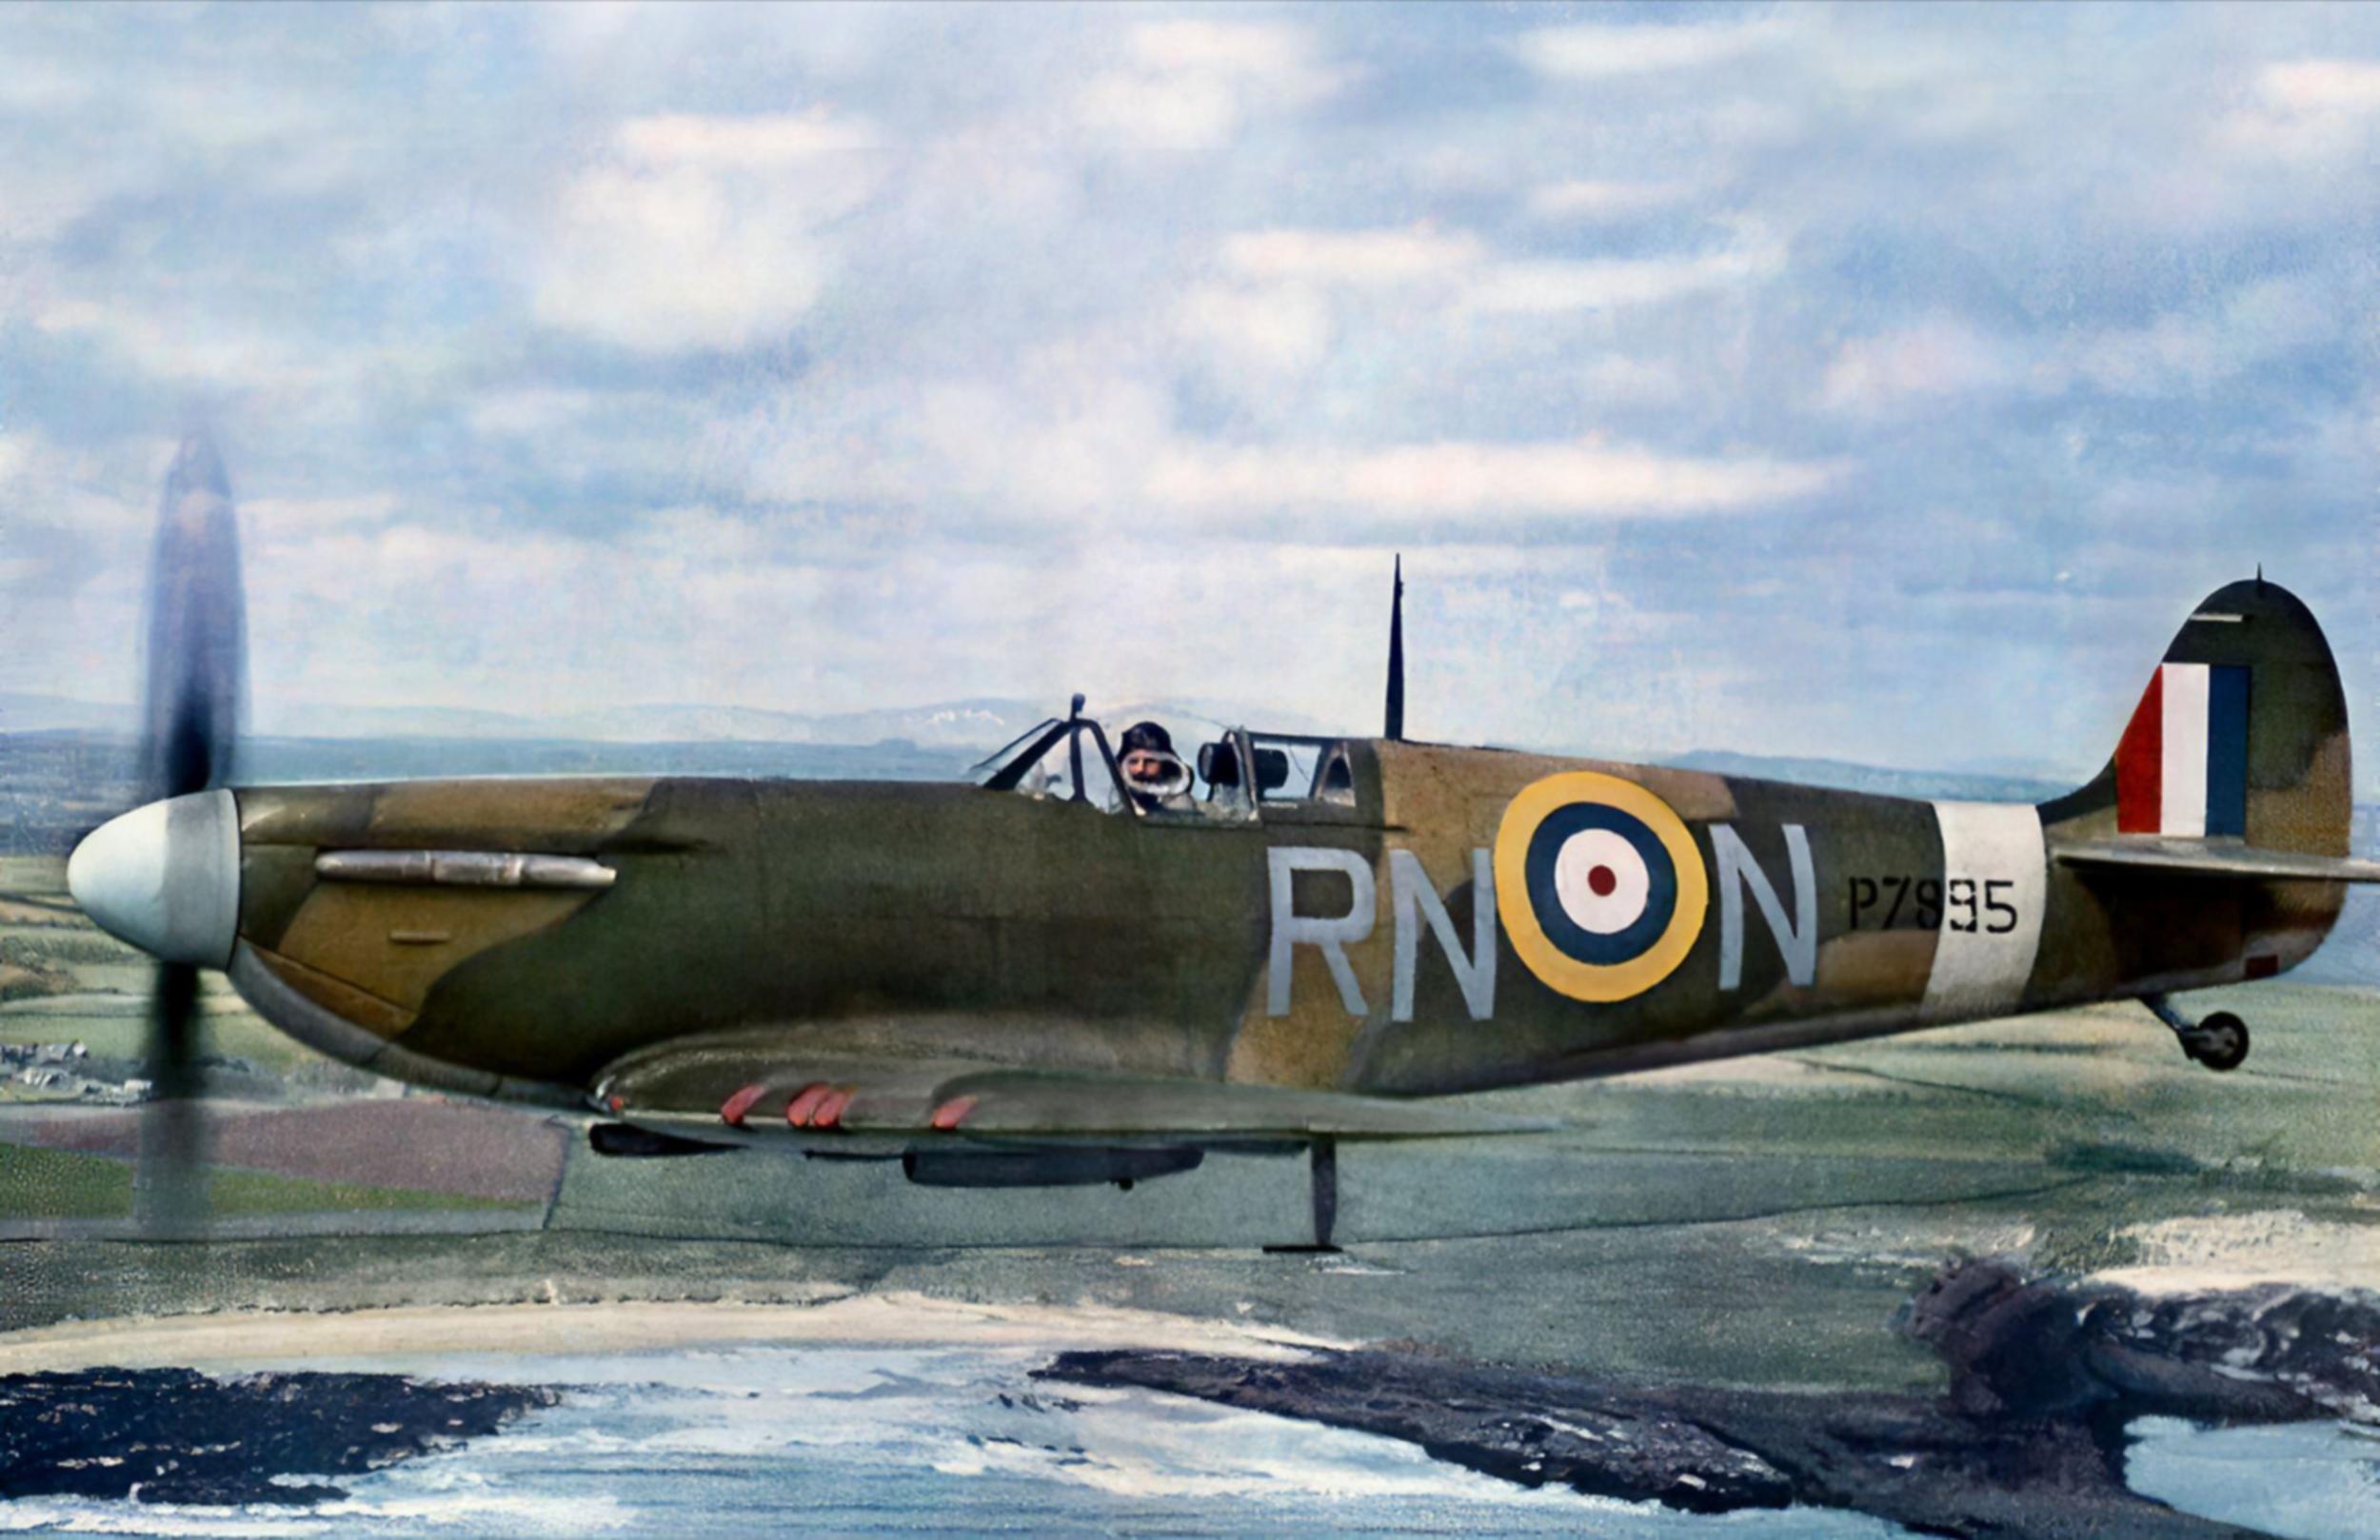 Spitfire MkIIa RAF 72Sqn RNN Flt Lt R Deacon Elliot P7895 based at Acklington Northumberland April 1941 01